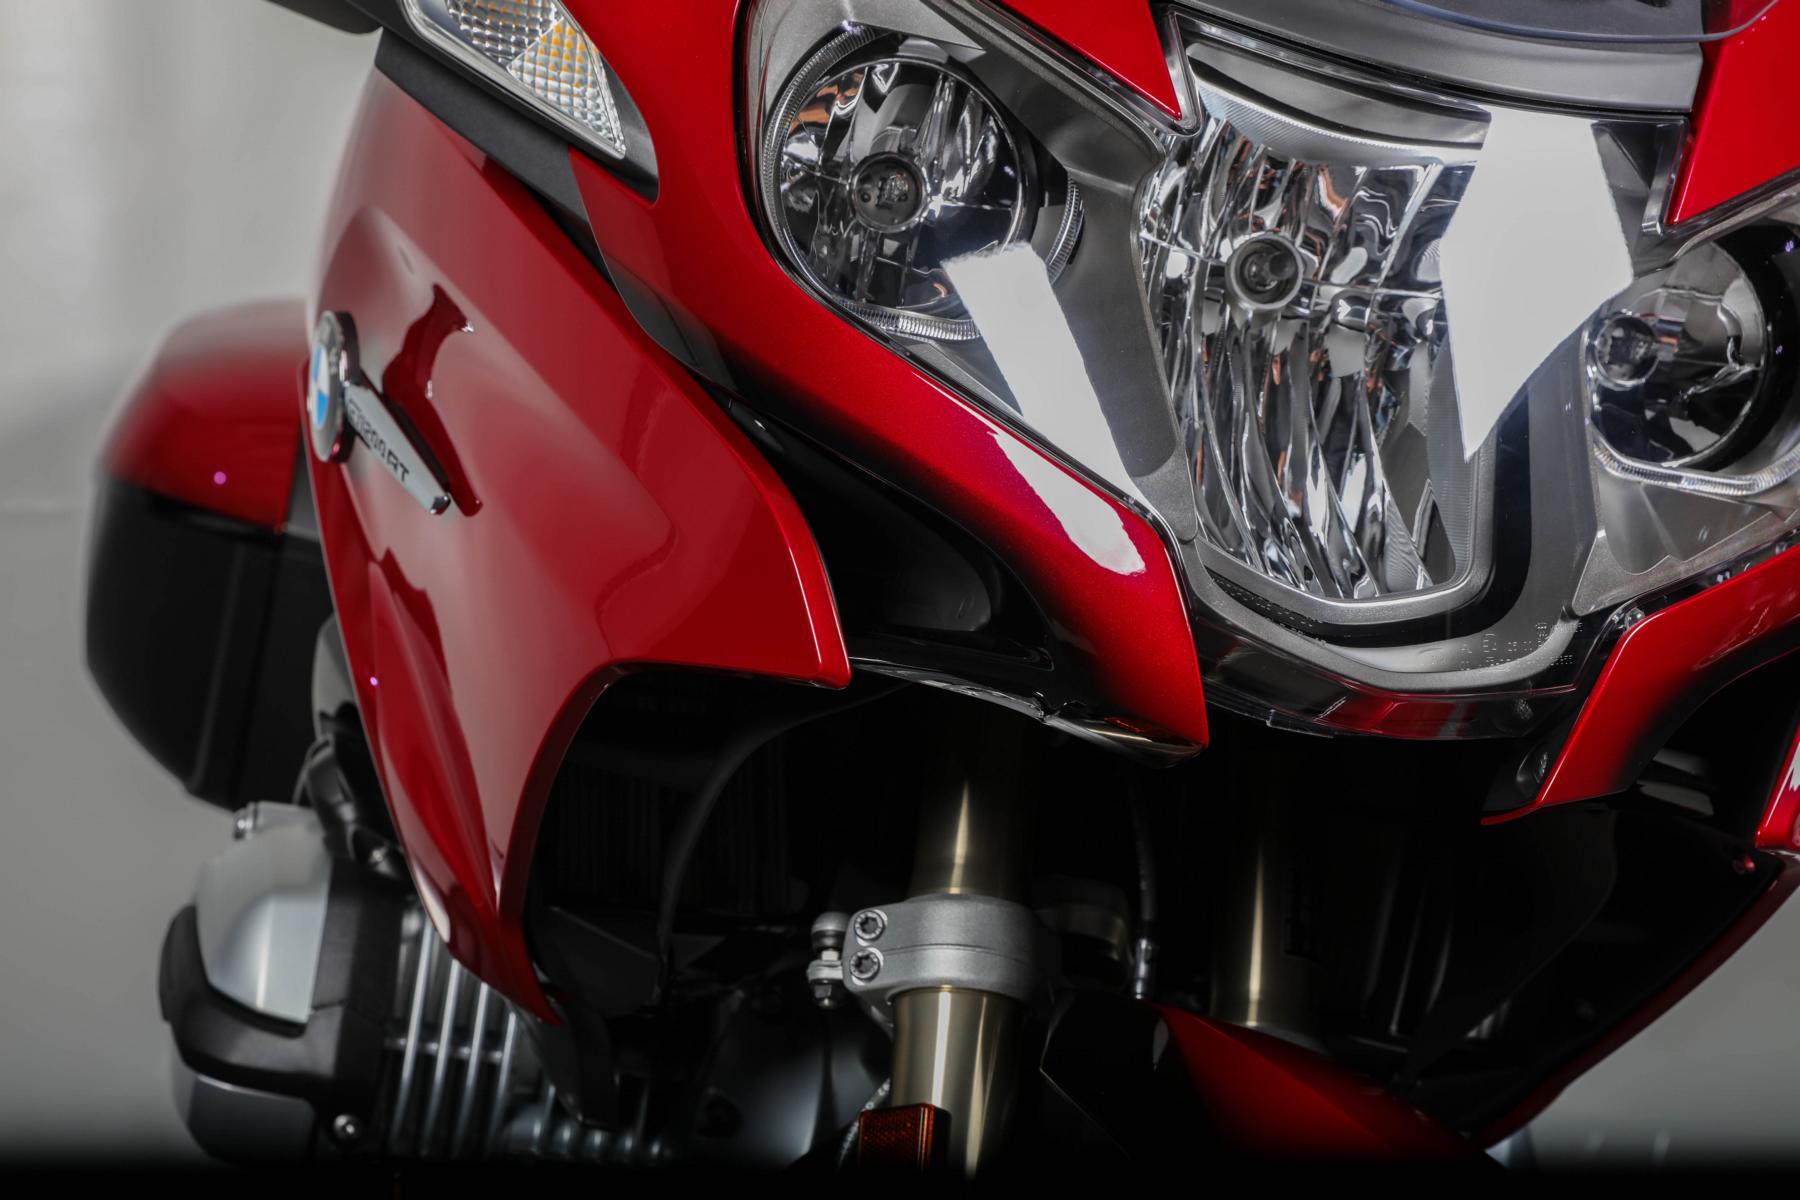 R1200RT Fuchs Edition